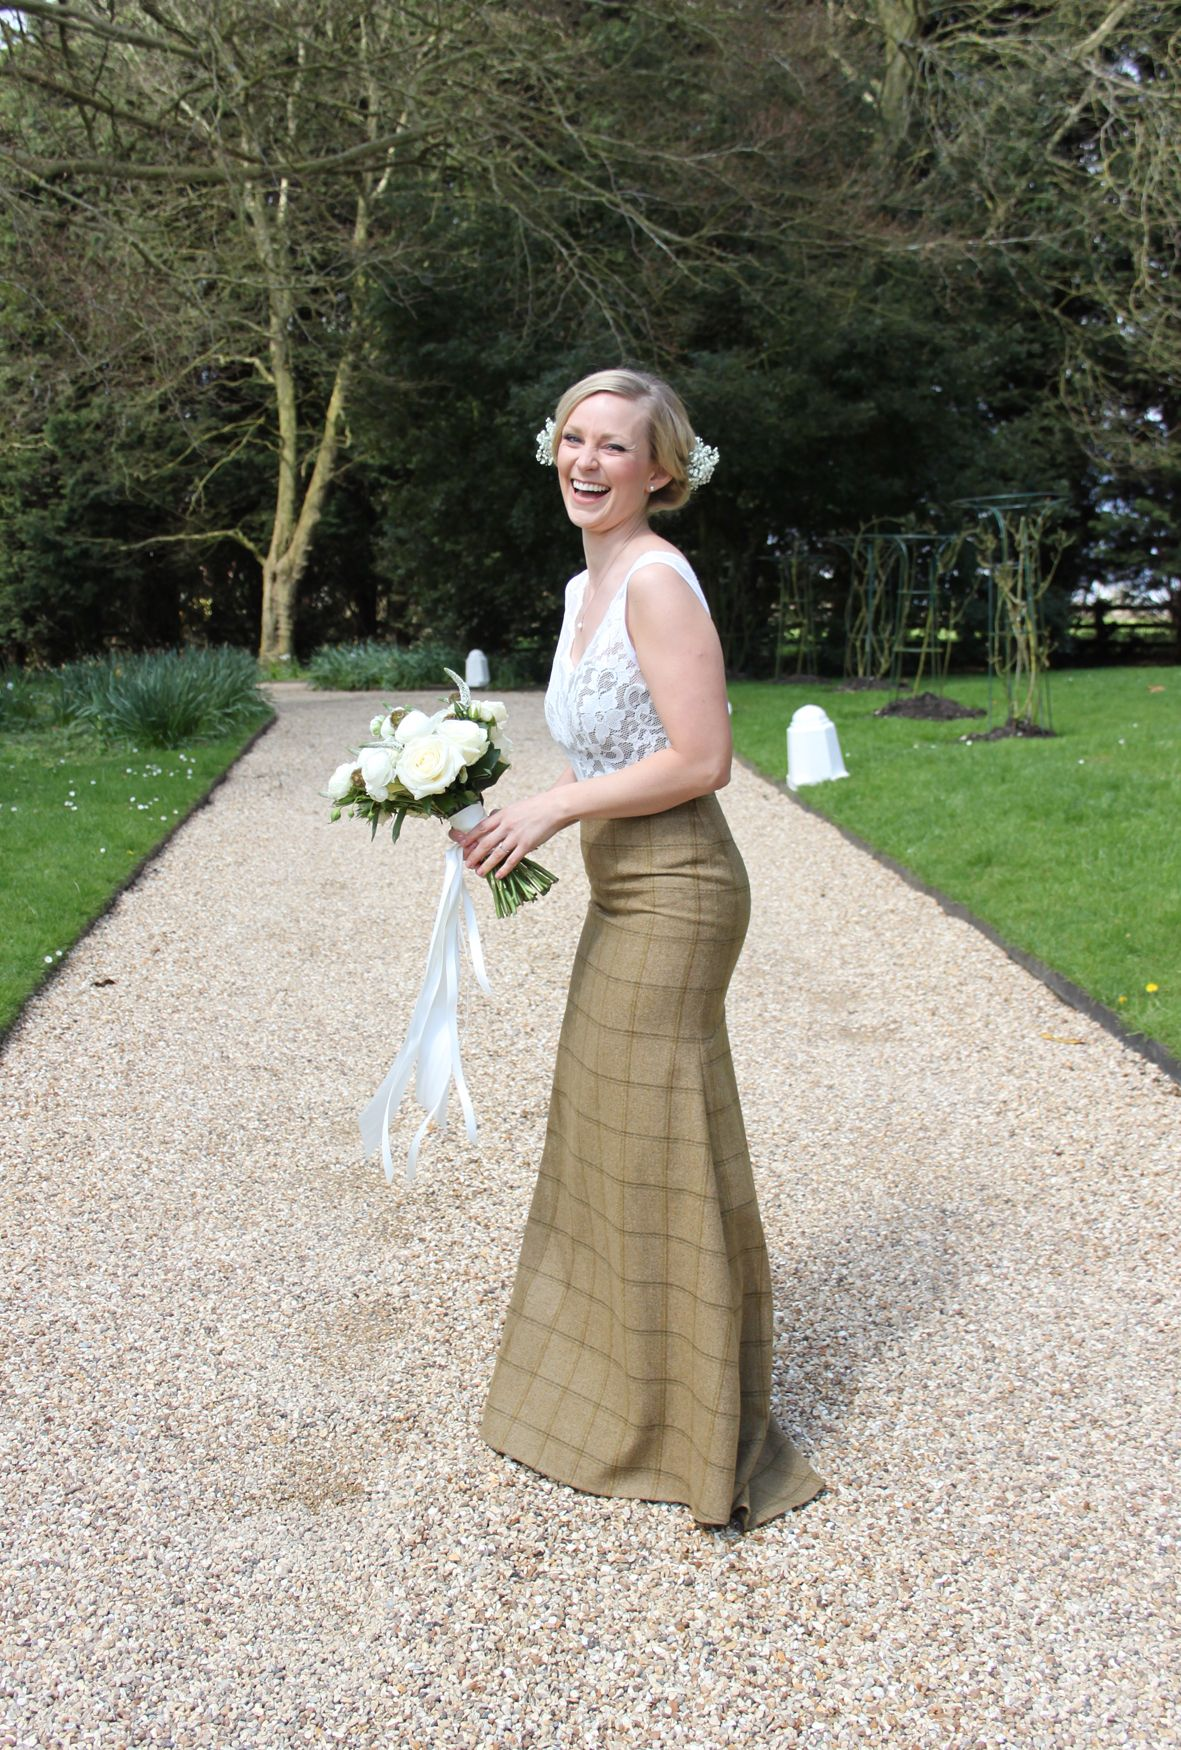 Our Gorgeous Aurora Tweed Wedding Dress 3 Http Www Timothyfoxx Co Uk Products Aurora Tweed Wedding Dress Tweed Wedding Wedding Dresses Sheath Wedding Dress